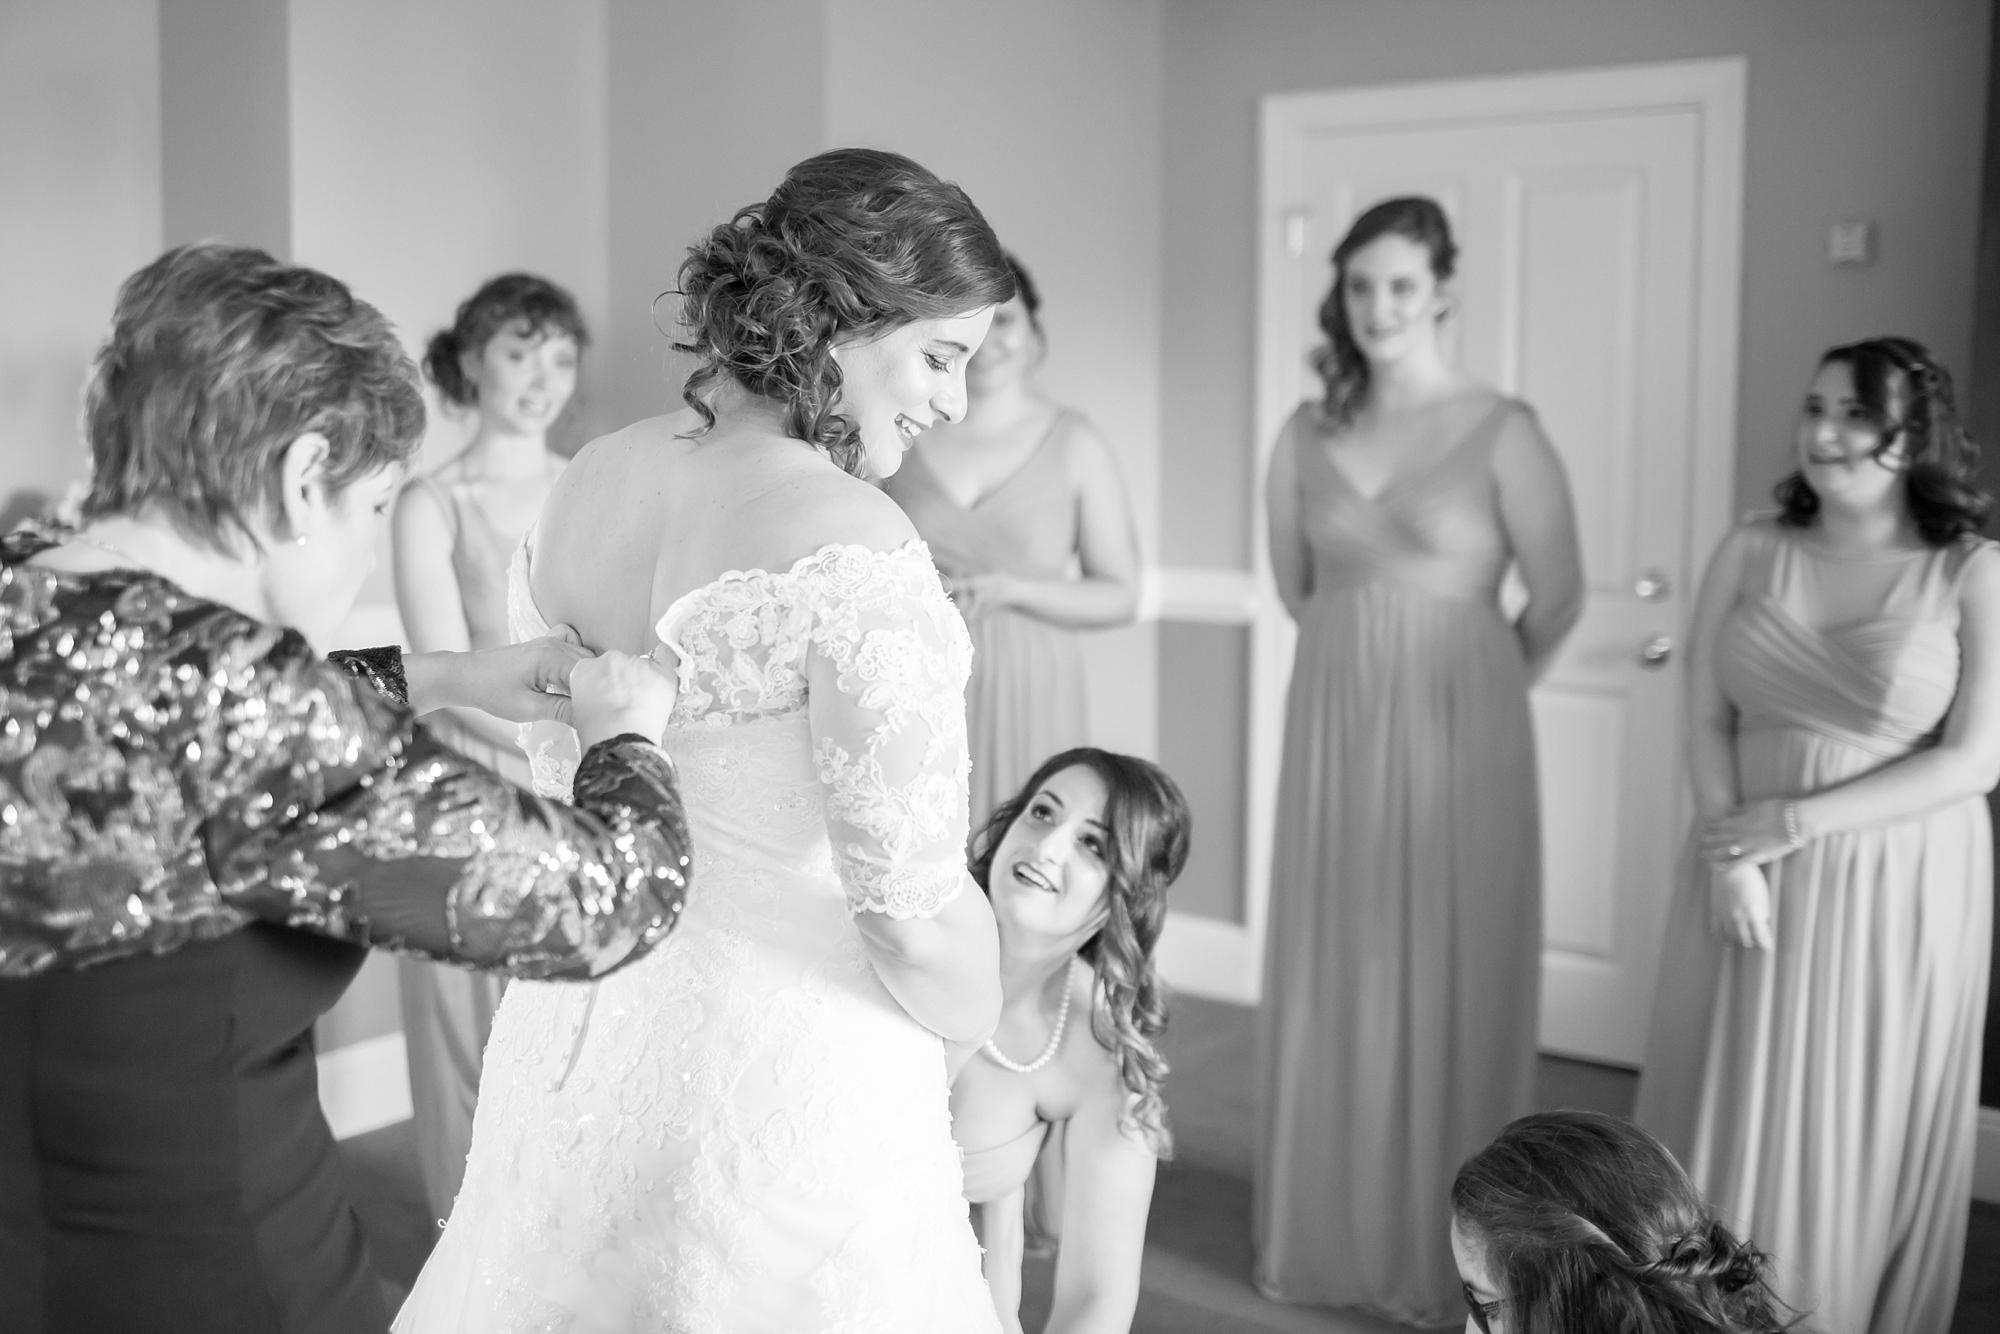 Simpson 1-Getting Ready-327_anna grace photography virginia wedding photographer irvine estate photo.jpg